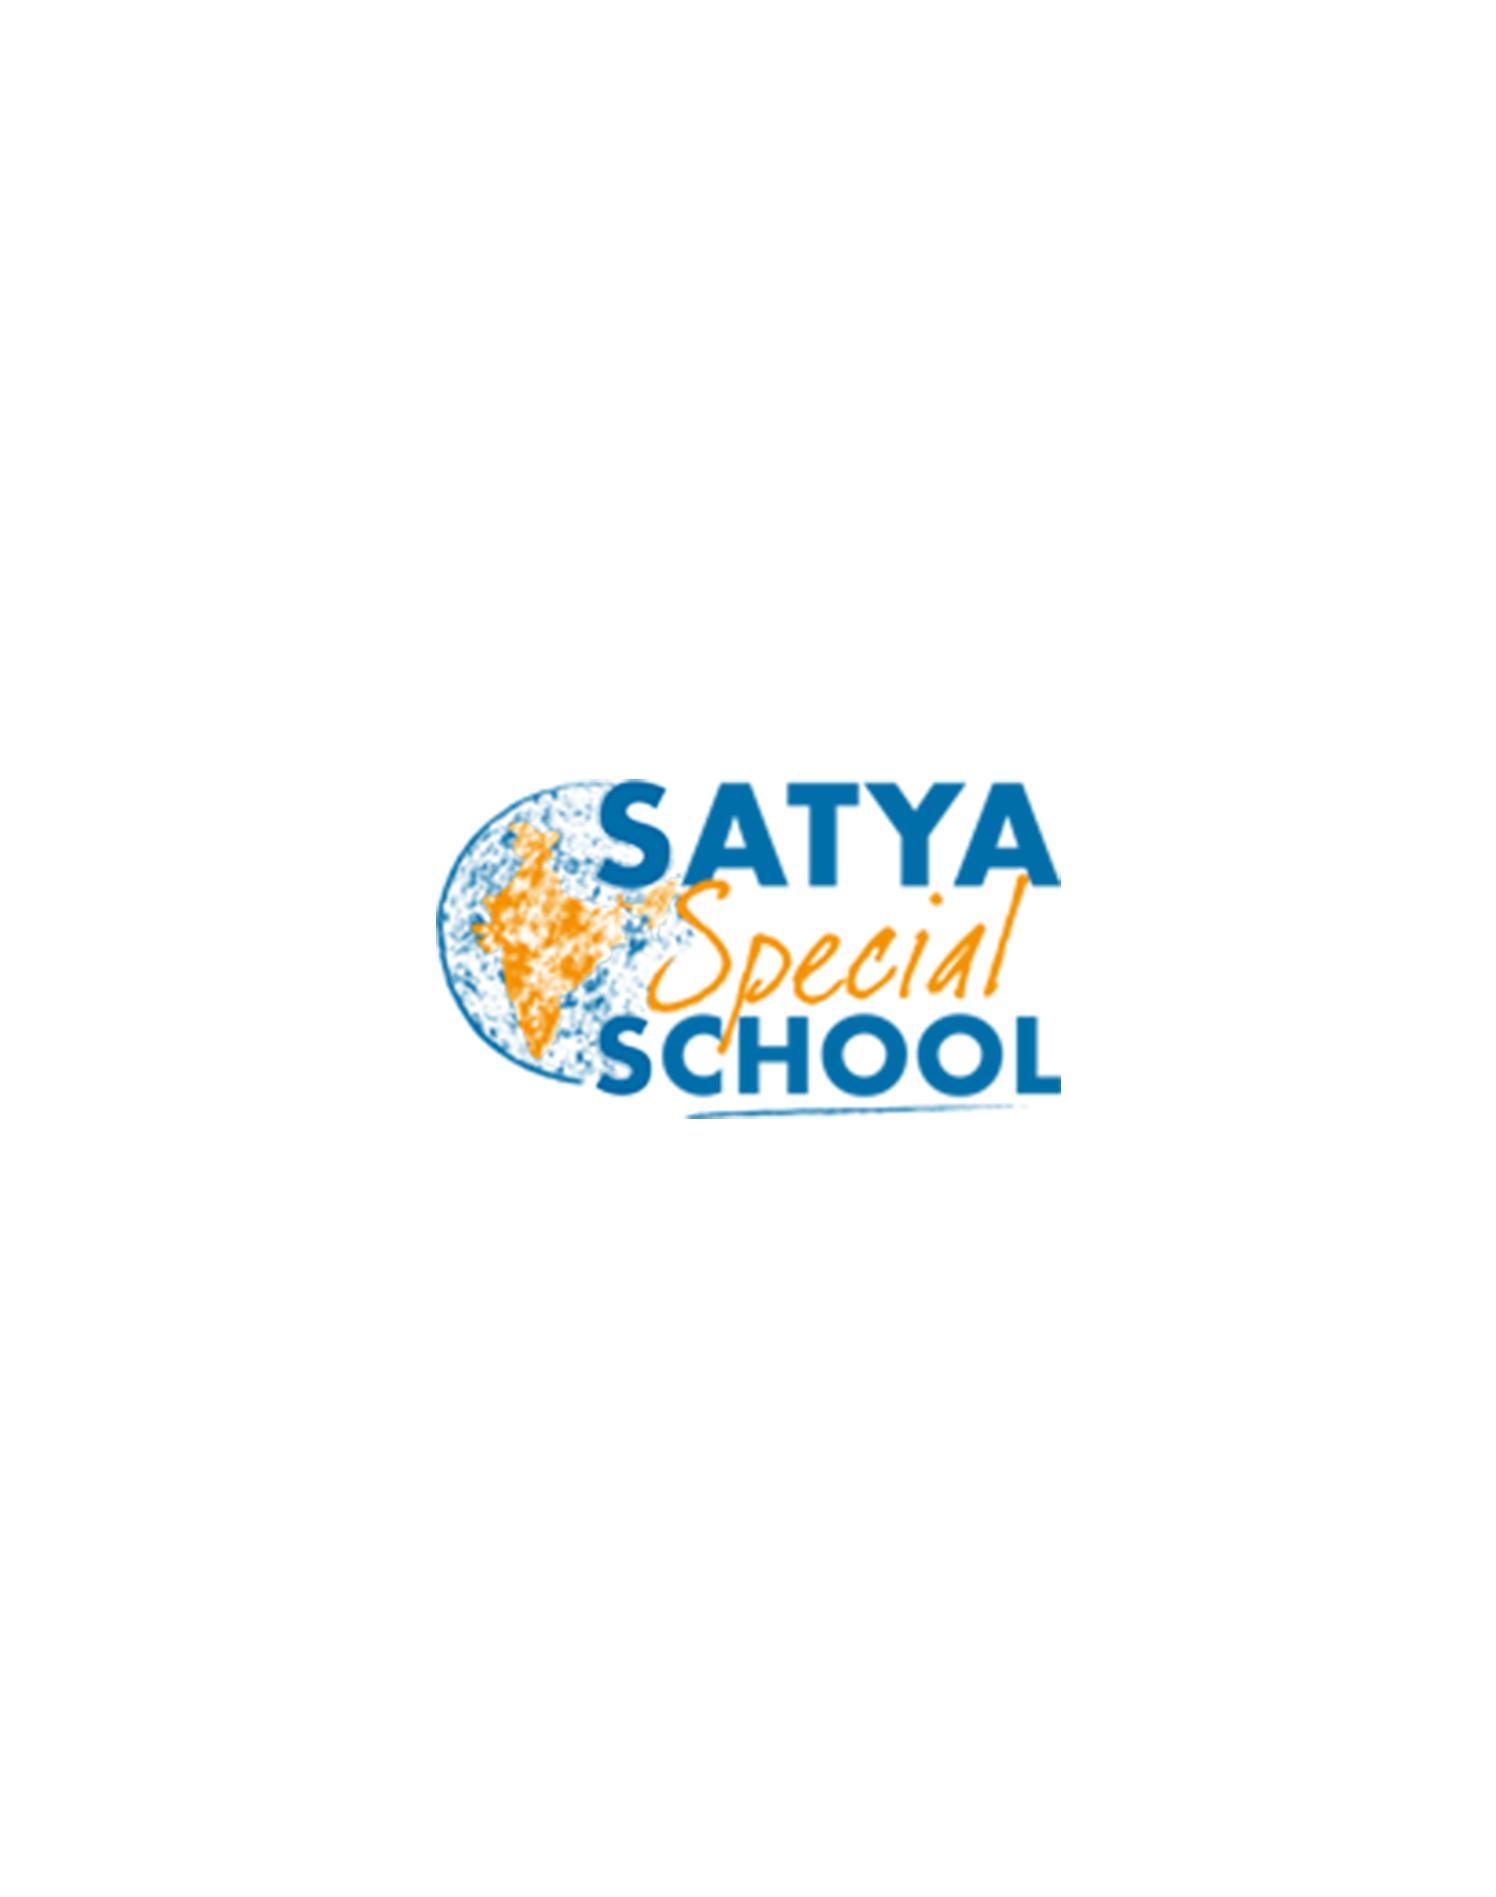 akka-philaction-partenaires-satya.png